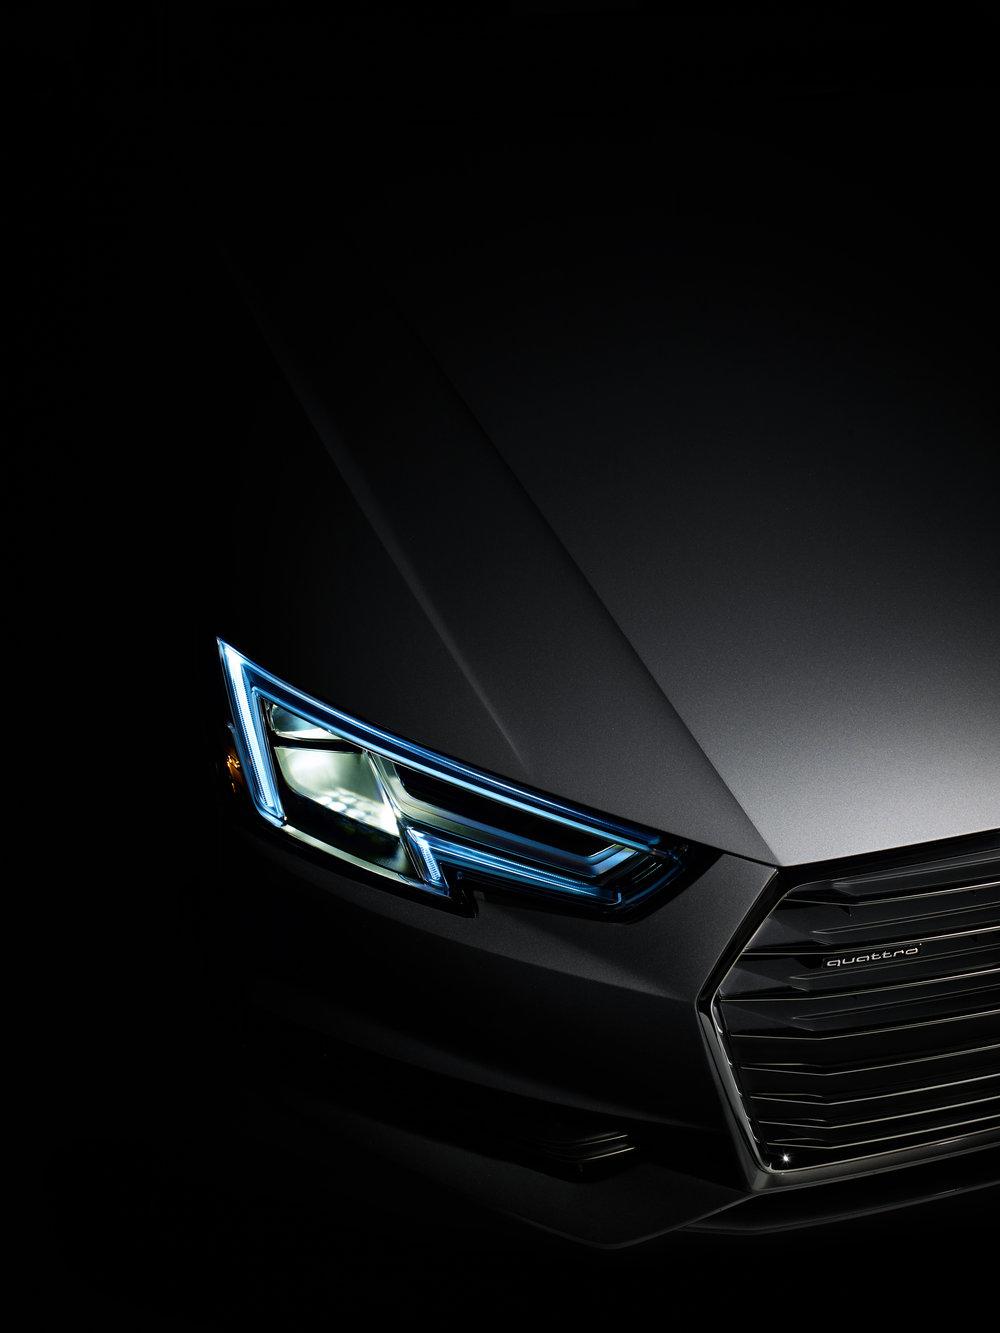 Audi_A4_In_The_Spotlight_D2_05.jpg